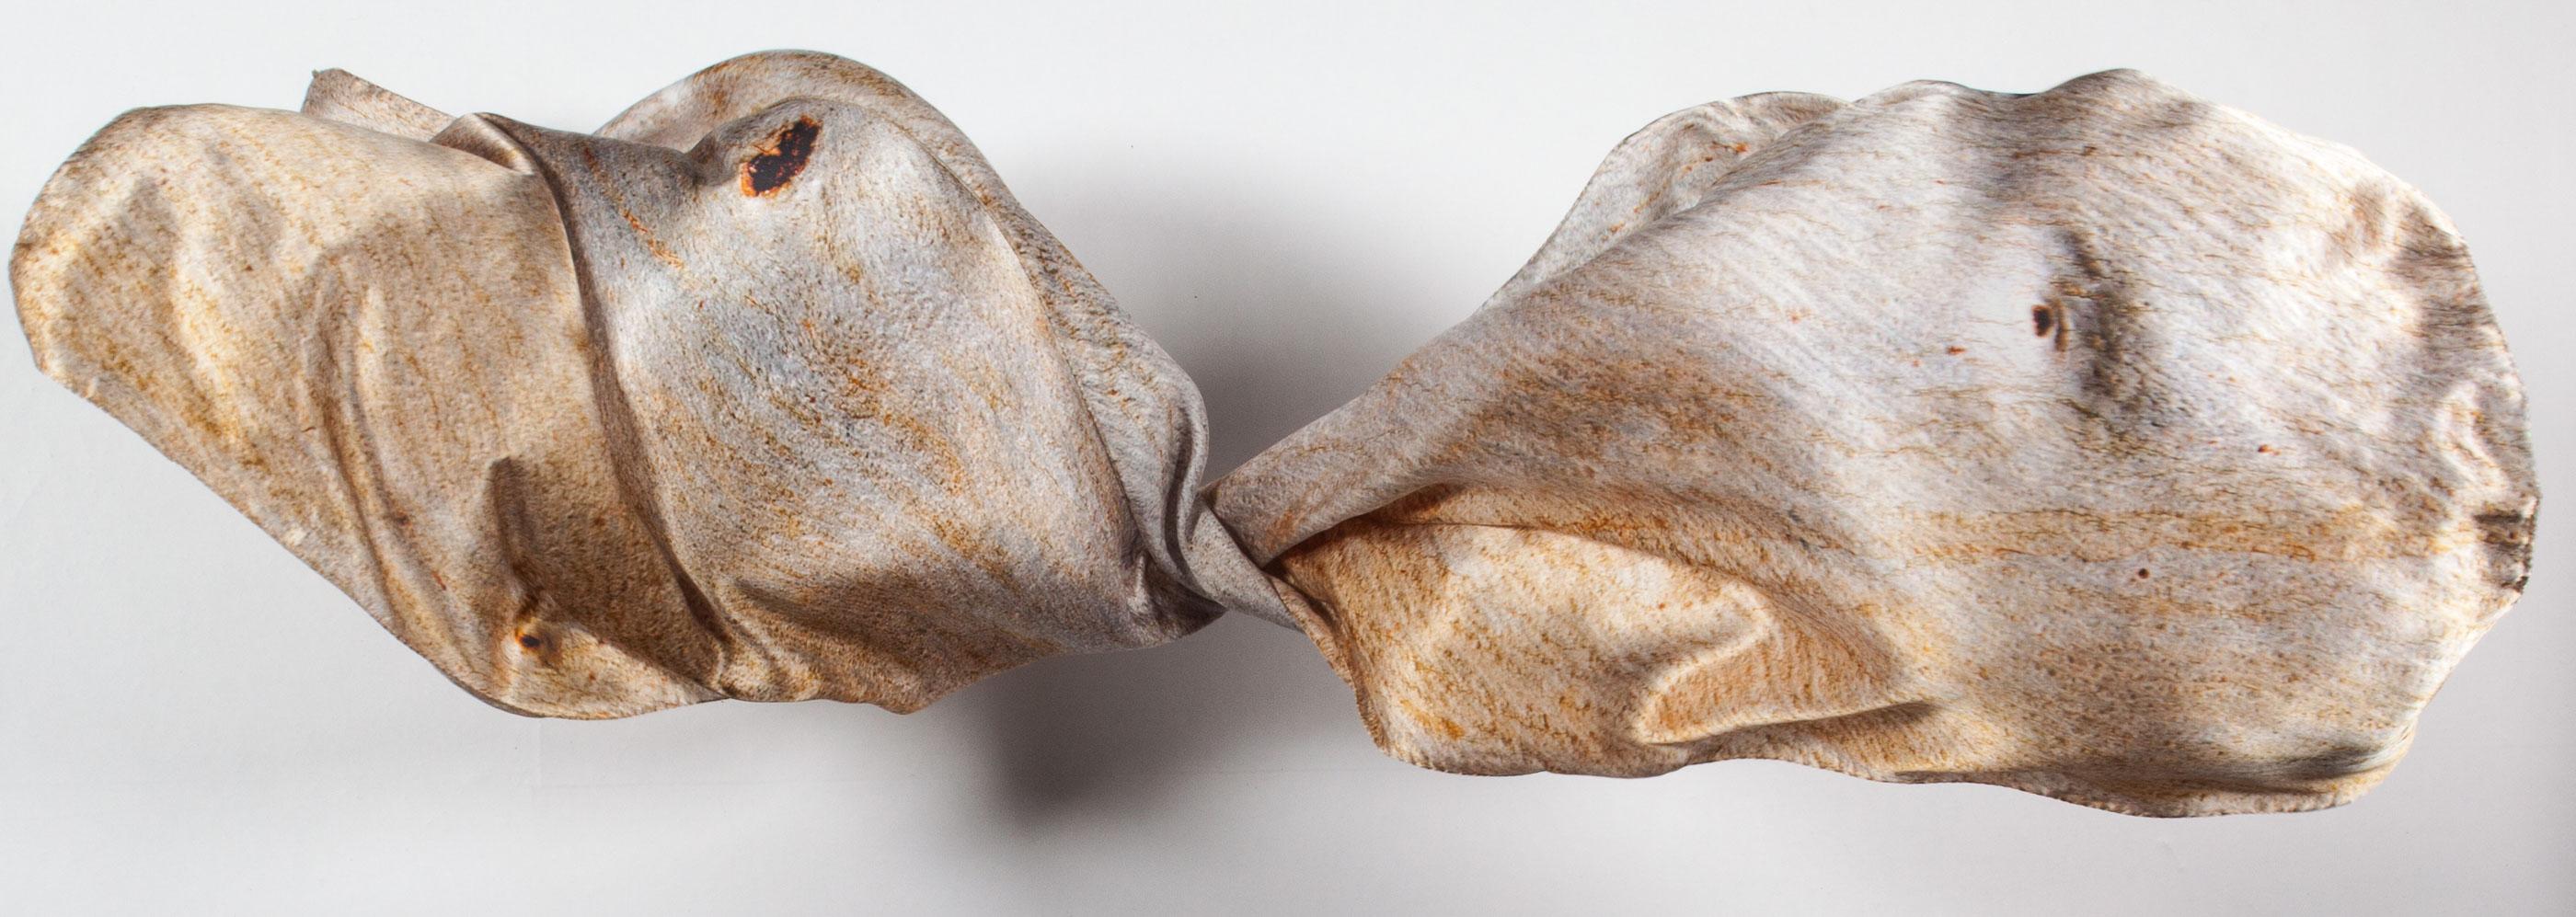 Cider Gum Eucalyptus Bark 100% Silk Scarf Made in Britain